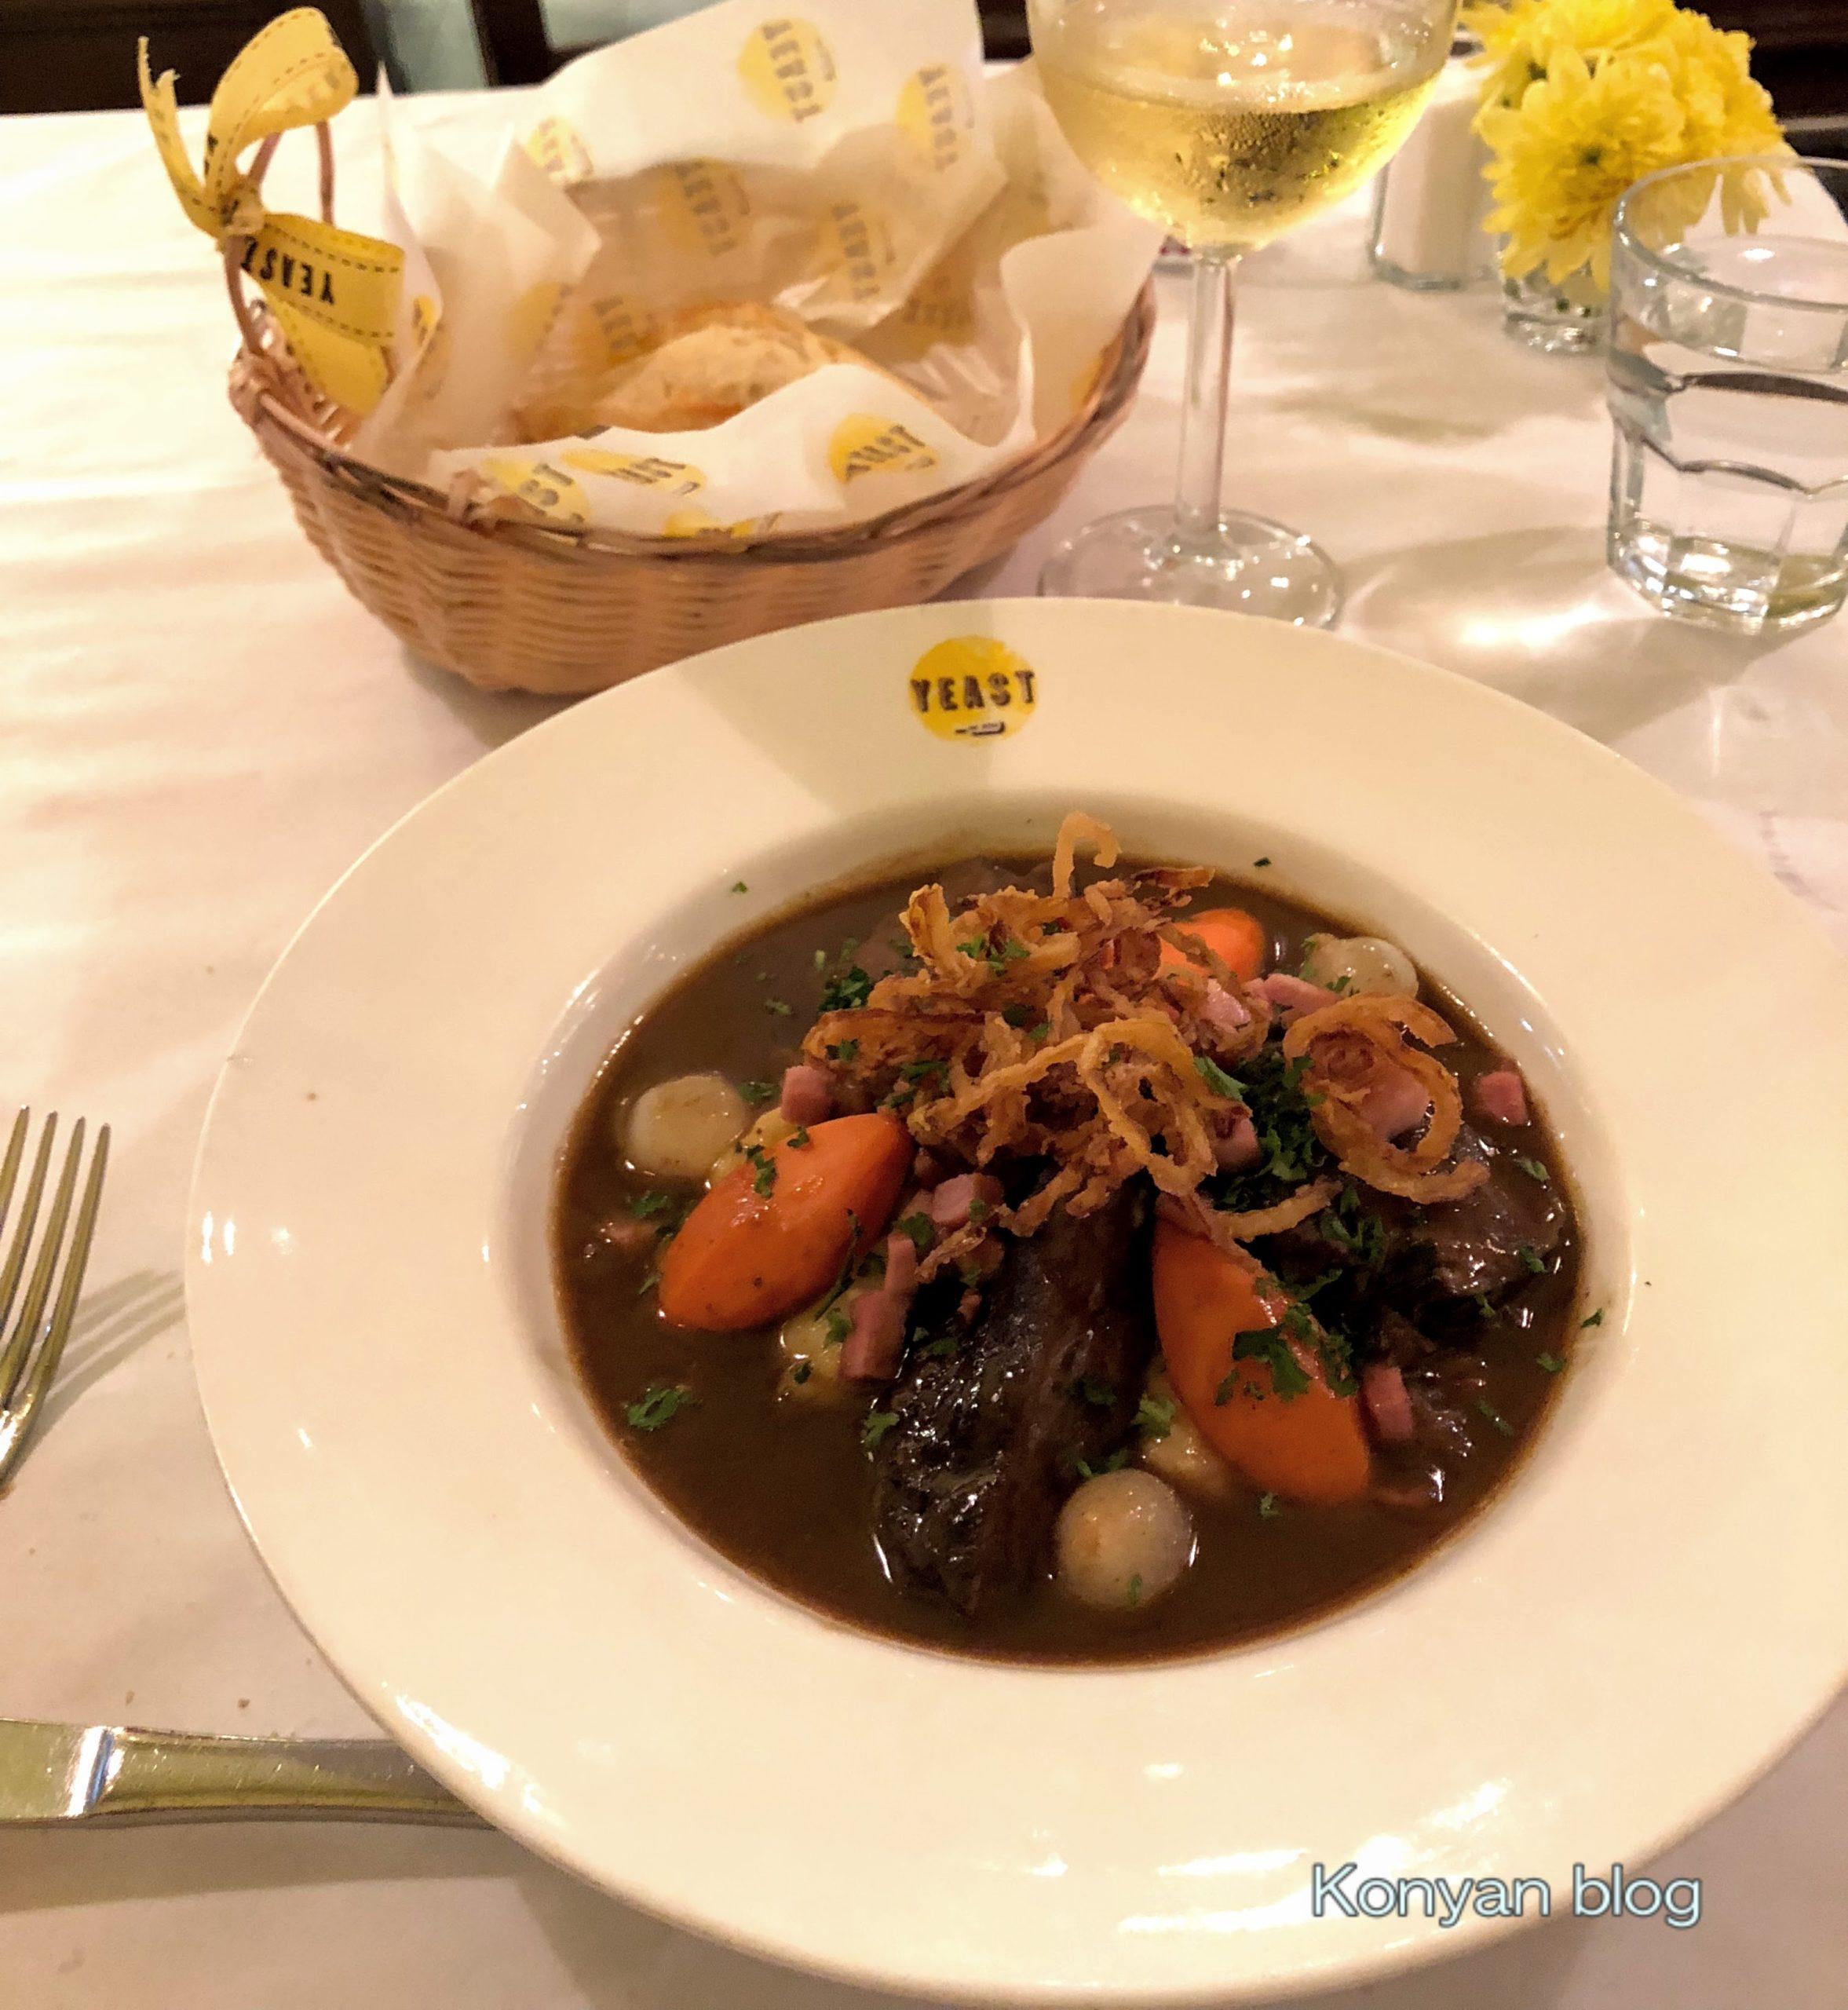 Yeast beef stew